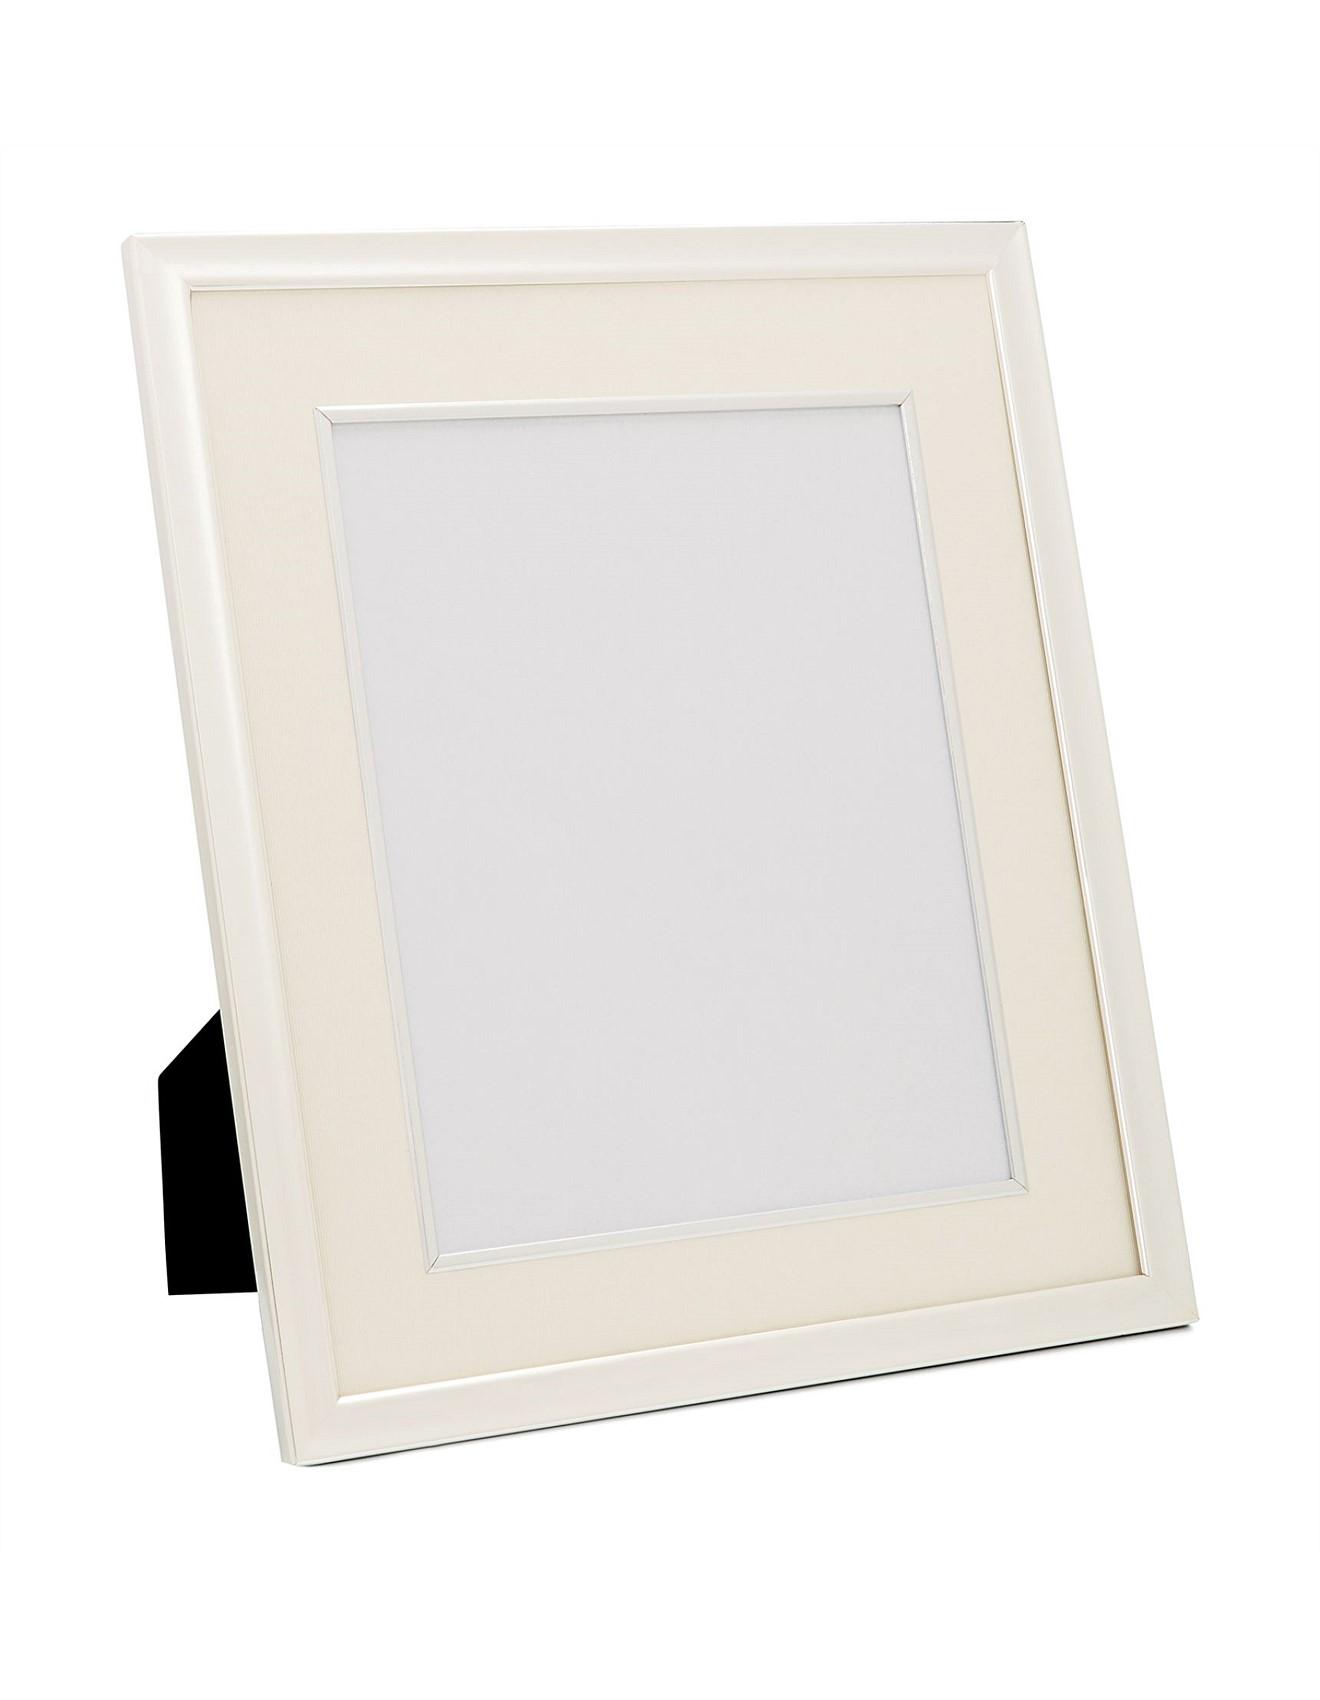 Photo Frames & Albums | Picture Frames Online | David Jones ...